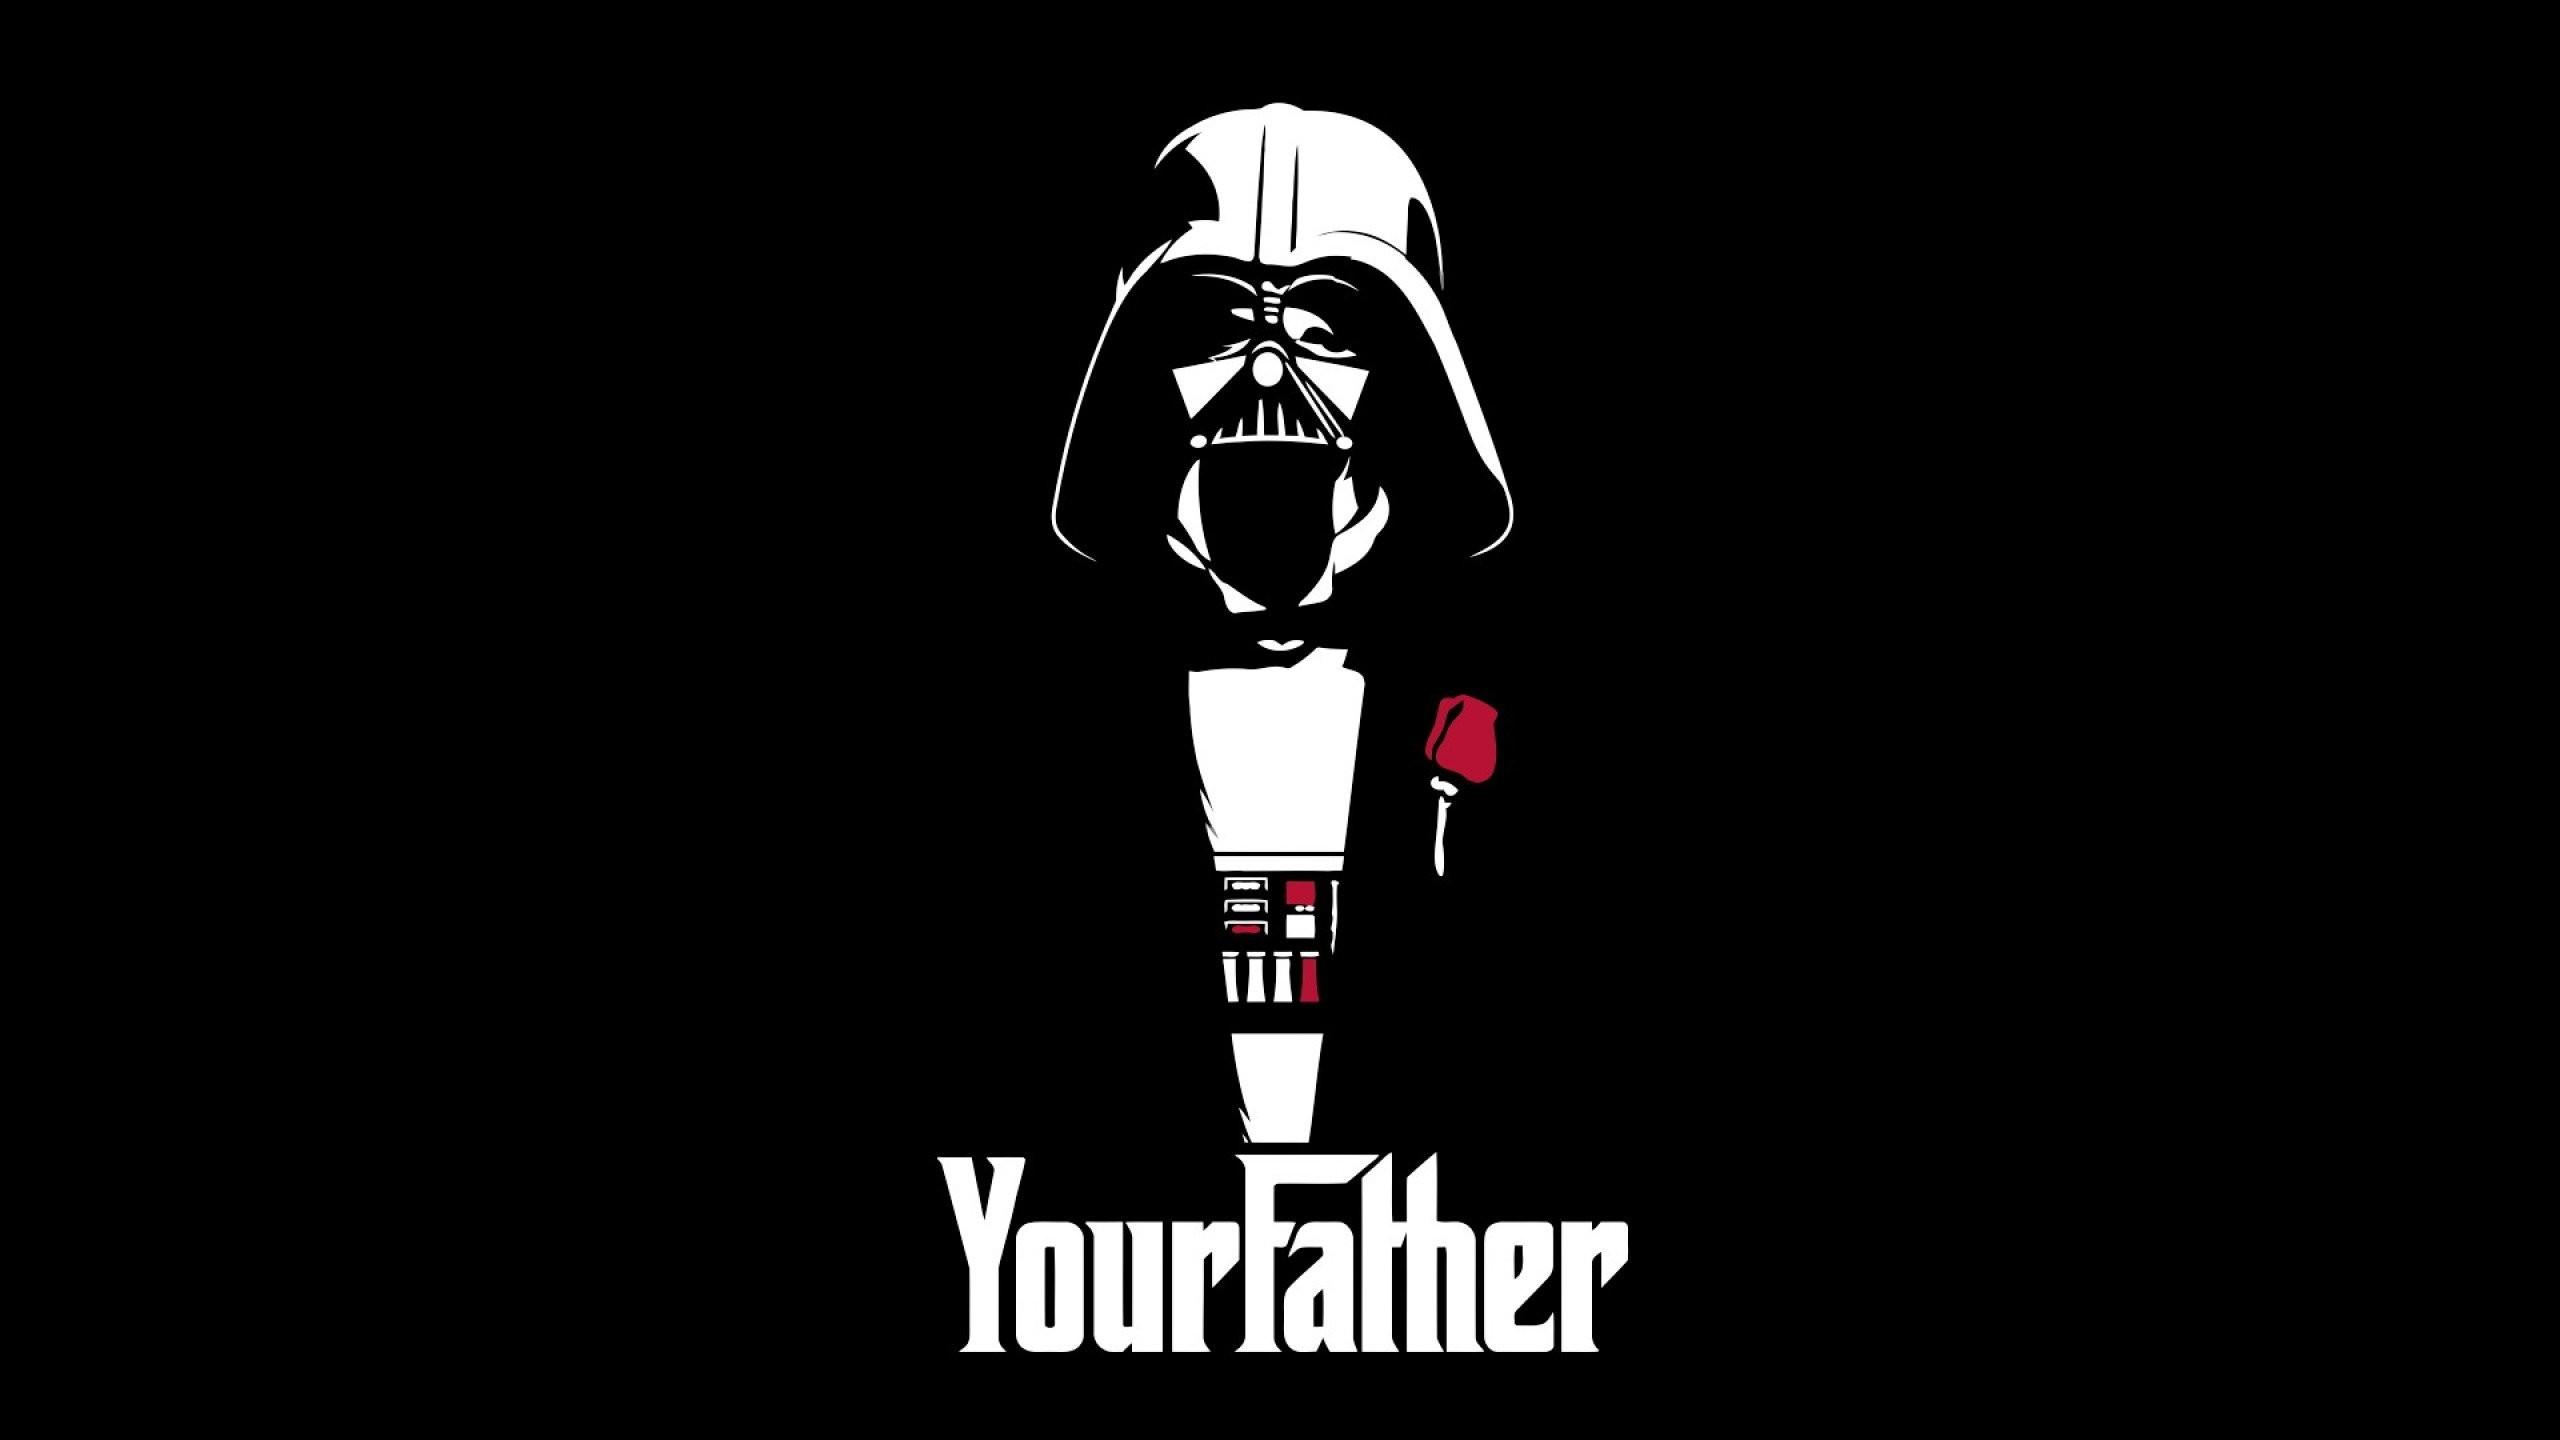 Darth Vader Wallpaper 76 Pictures